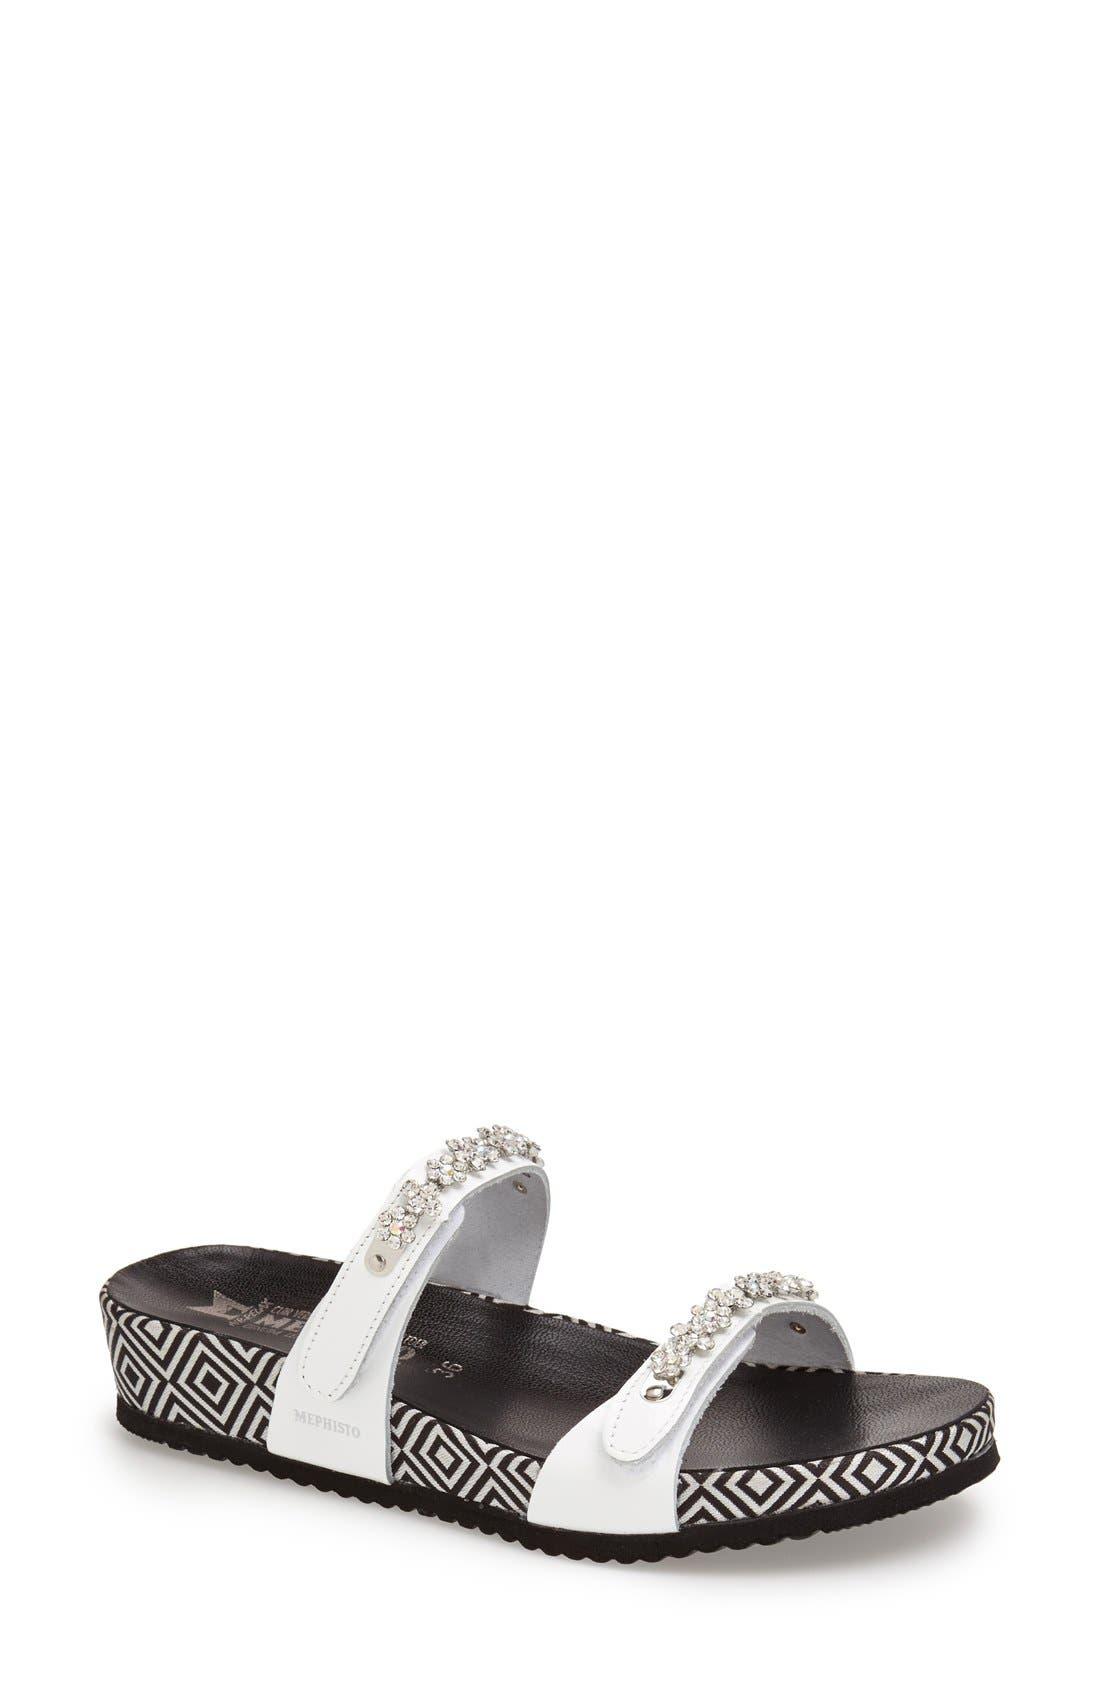 Main Image - Mephisto 'Ambre' Sandal